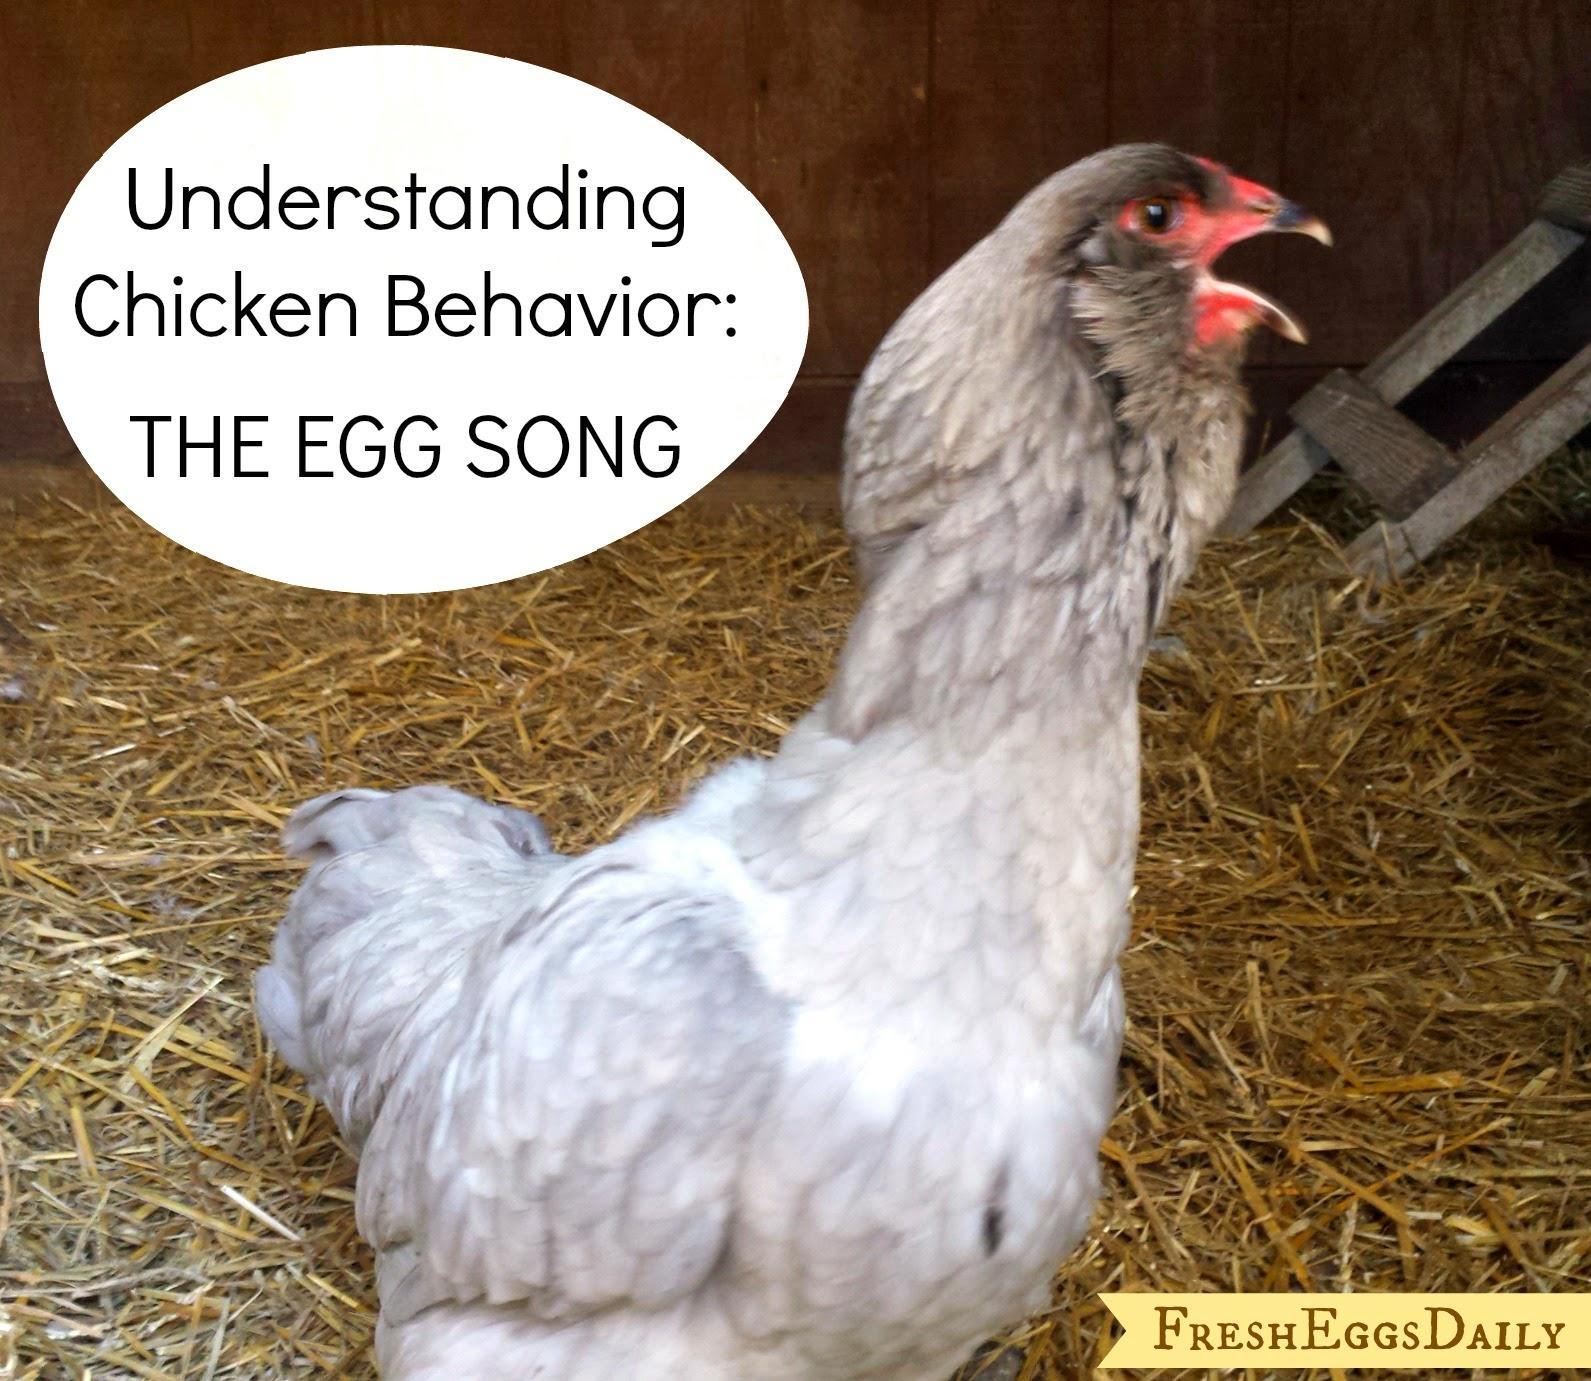 understanding chicken behavior interpreting the egg song fresh eggs daily. Black Bedroom Furniture Sets. Home Design Ideas